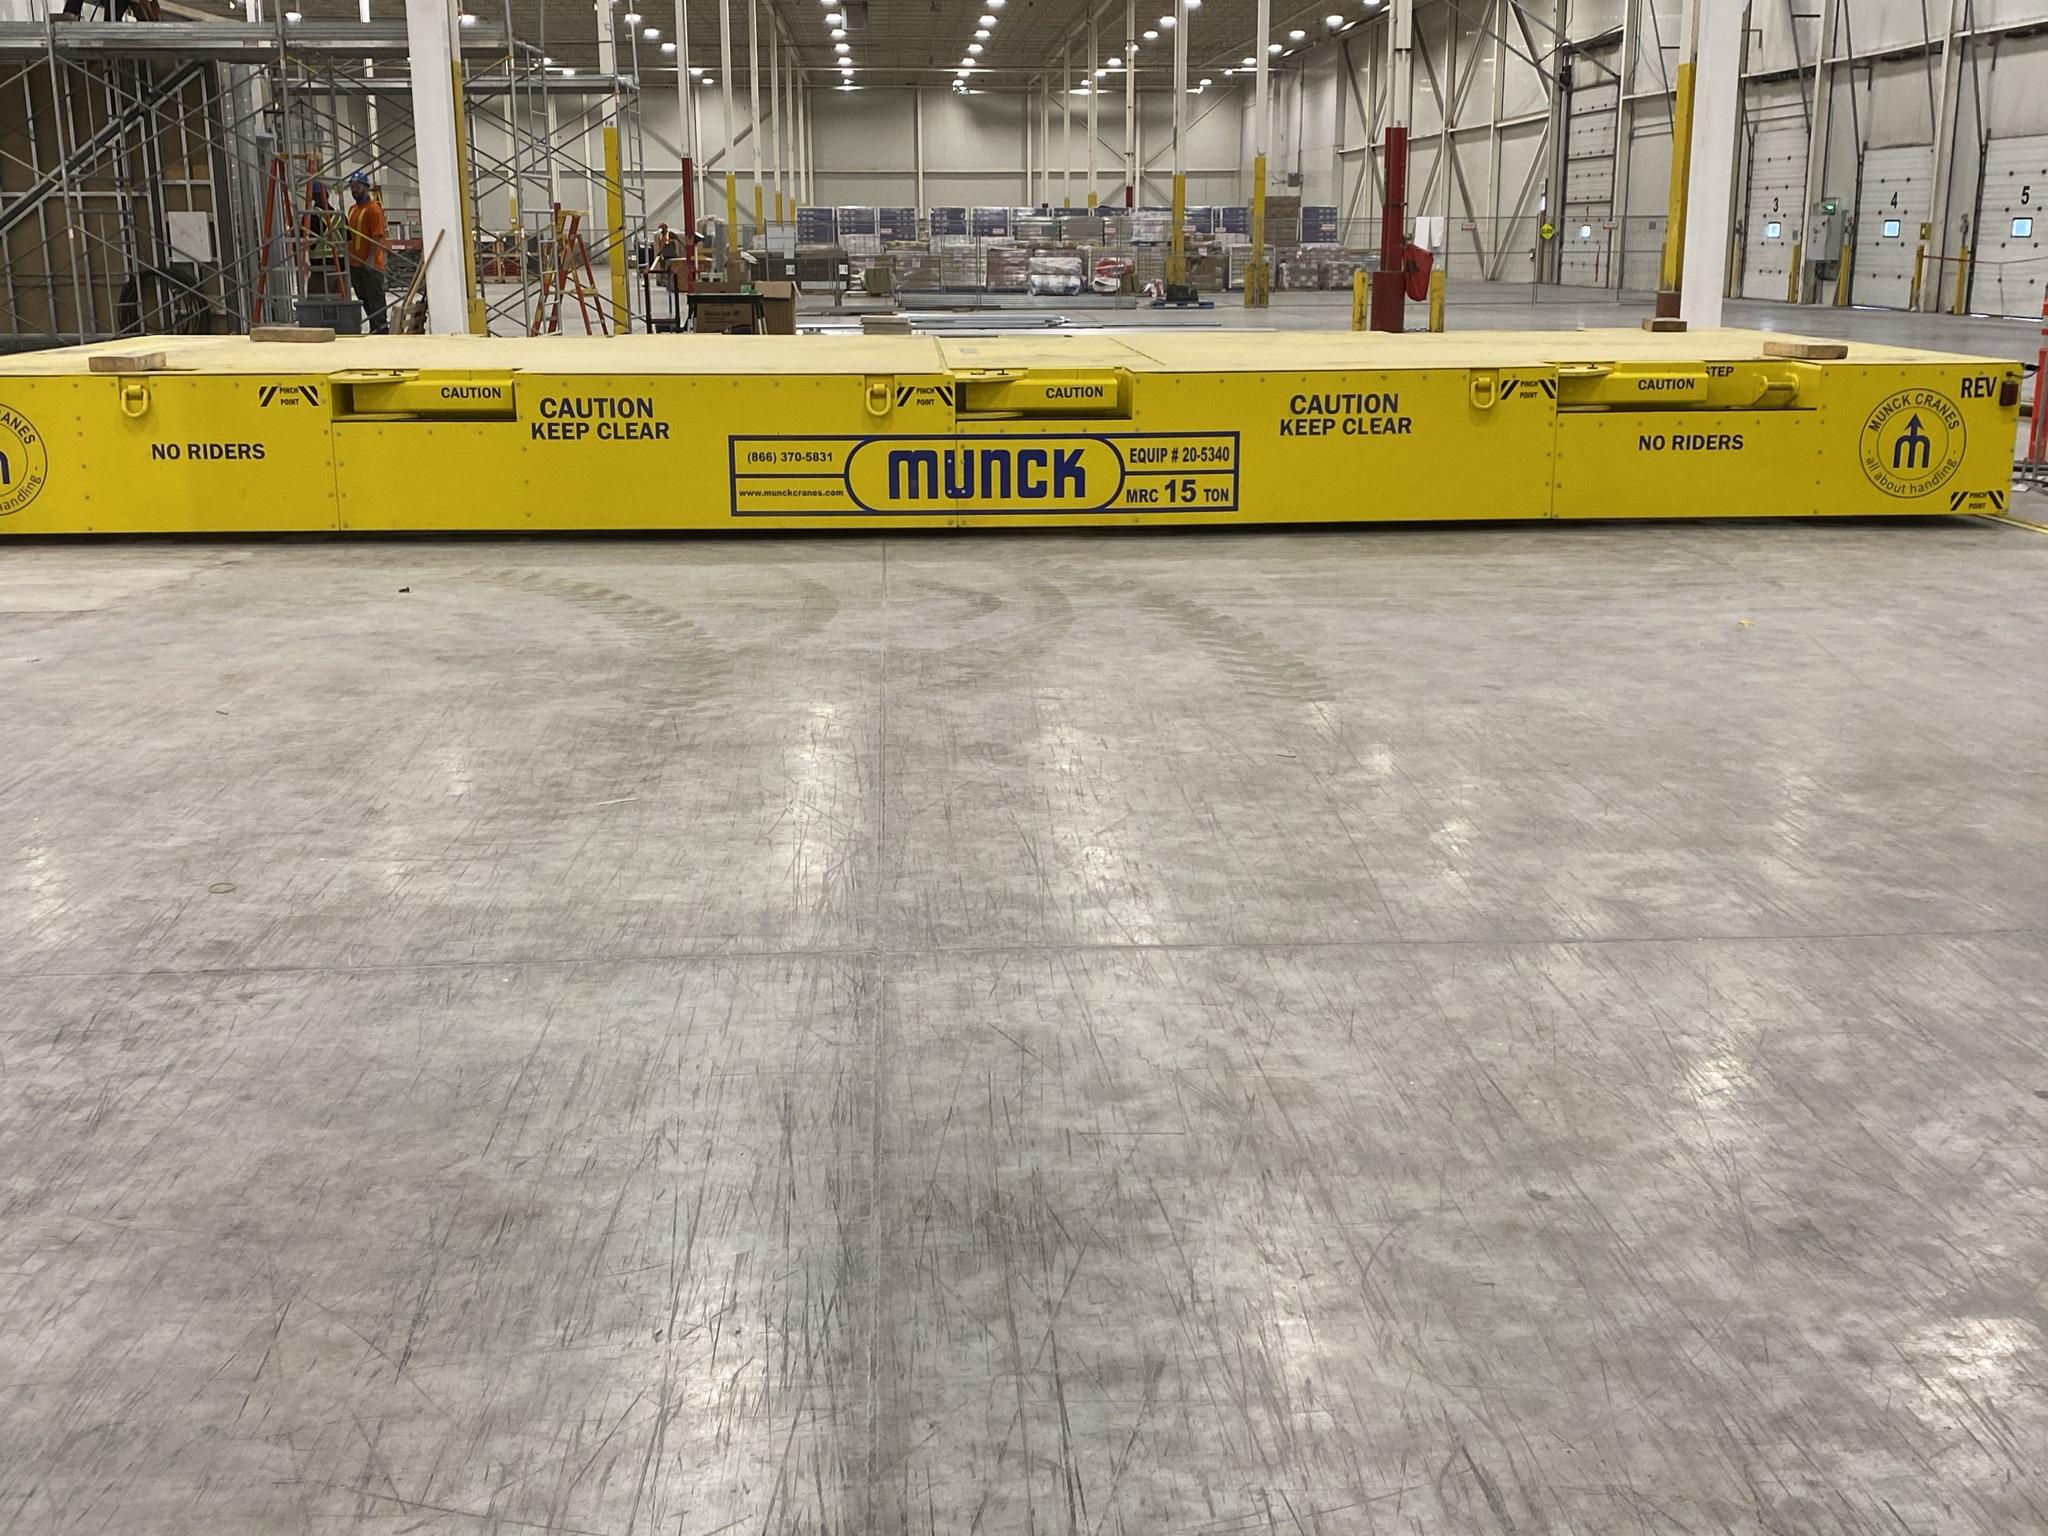 Flat Deck Transfer Cart, Battery Operated, Material Handling, Material Processing